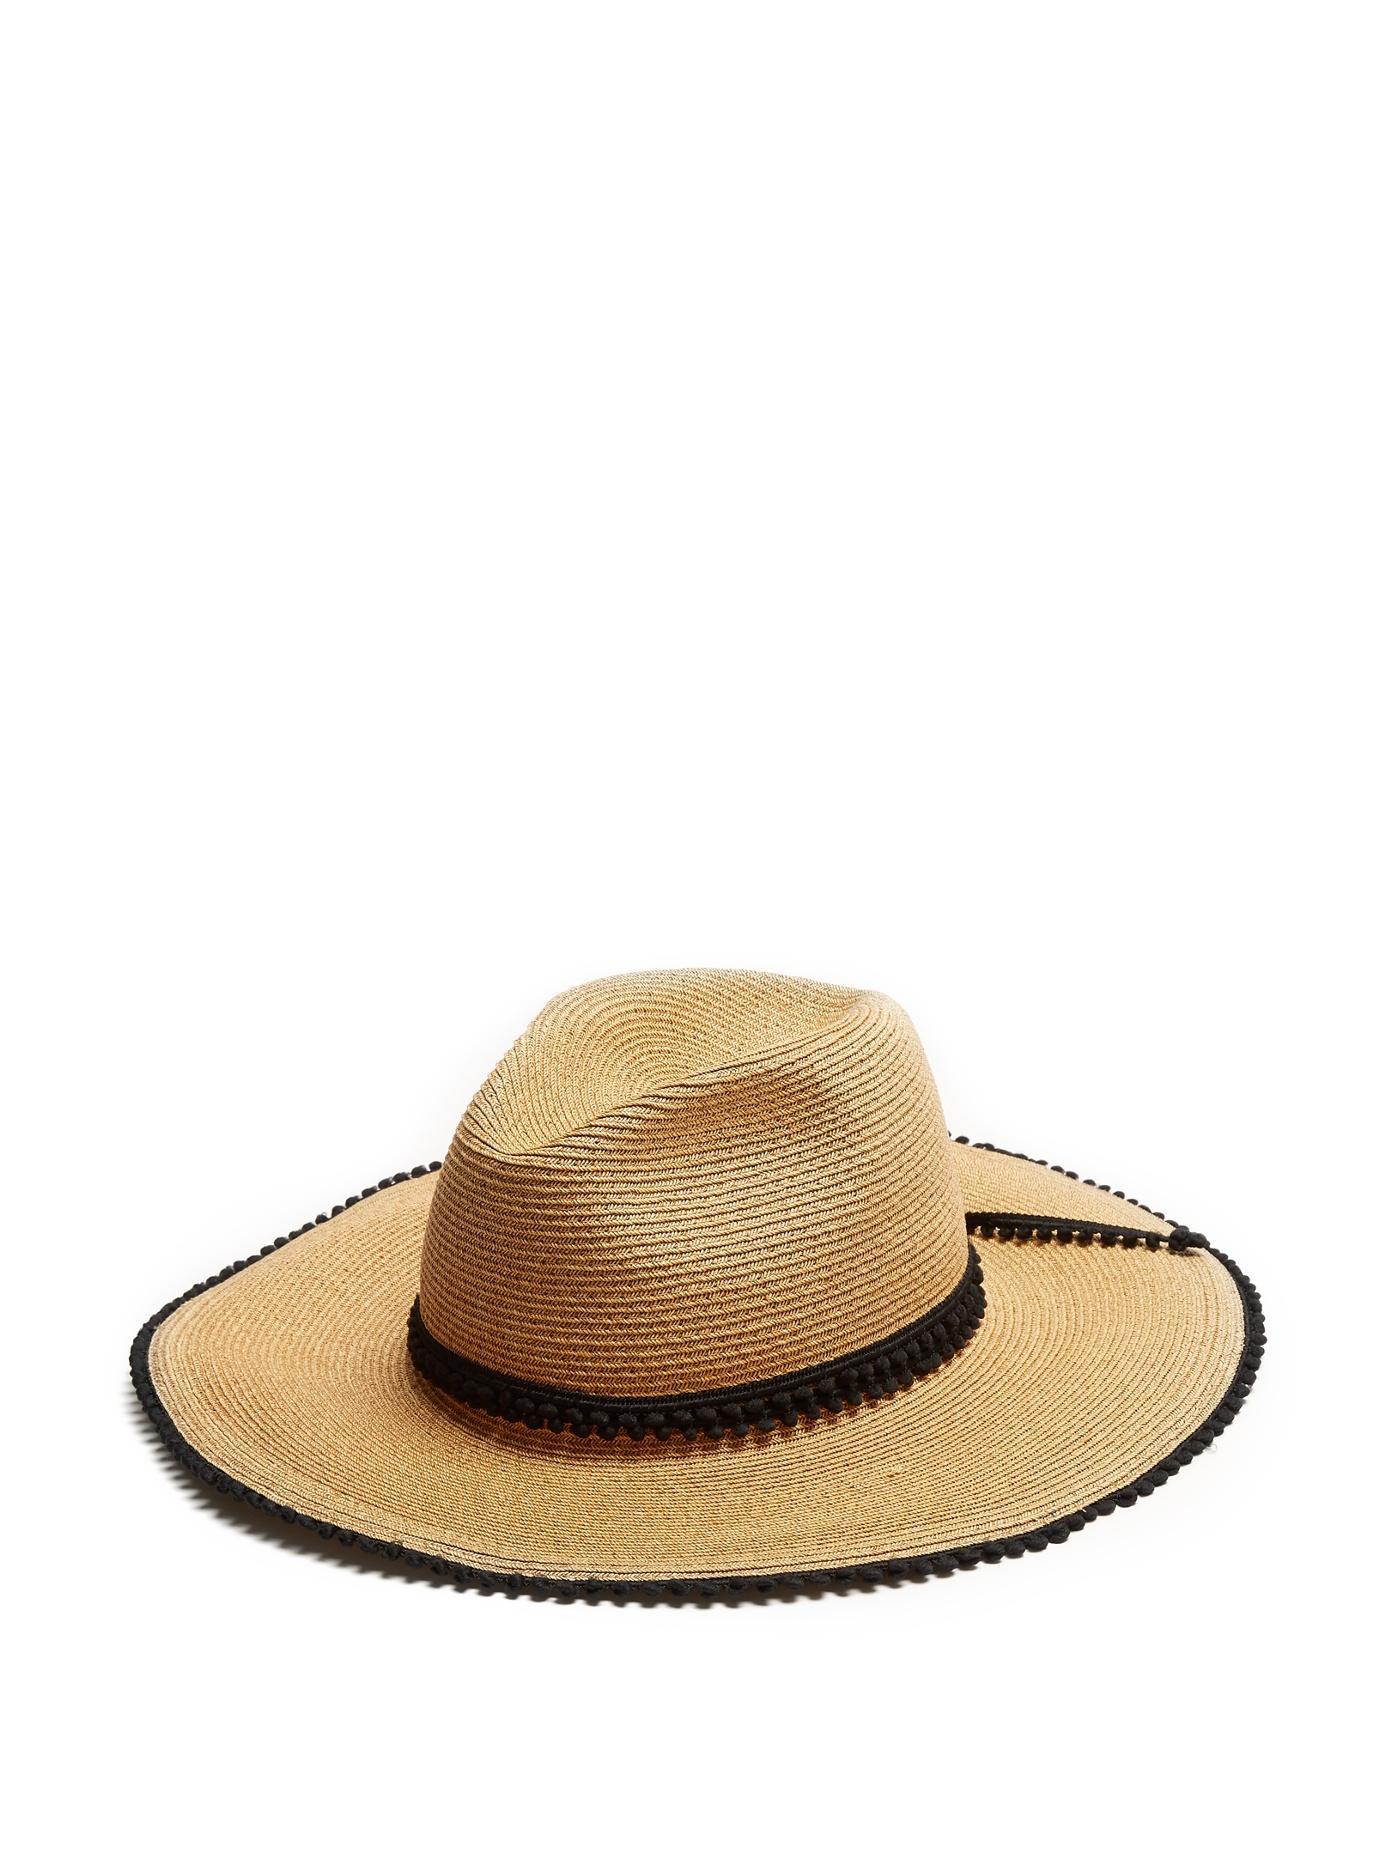 40cc1672 FilÙ Hats Batu Tara Pompom-Trimmed Straw Hat In Black Multi | ModeSens